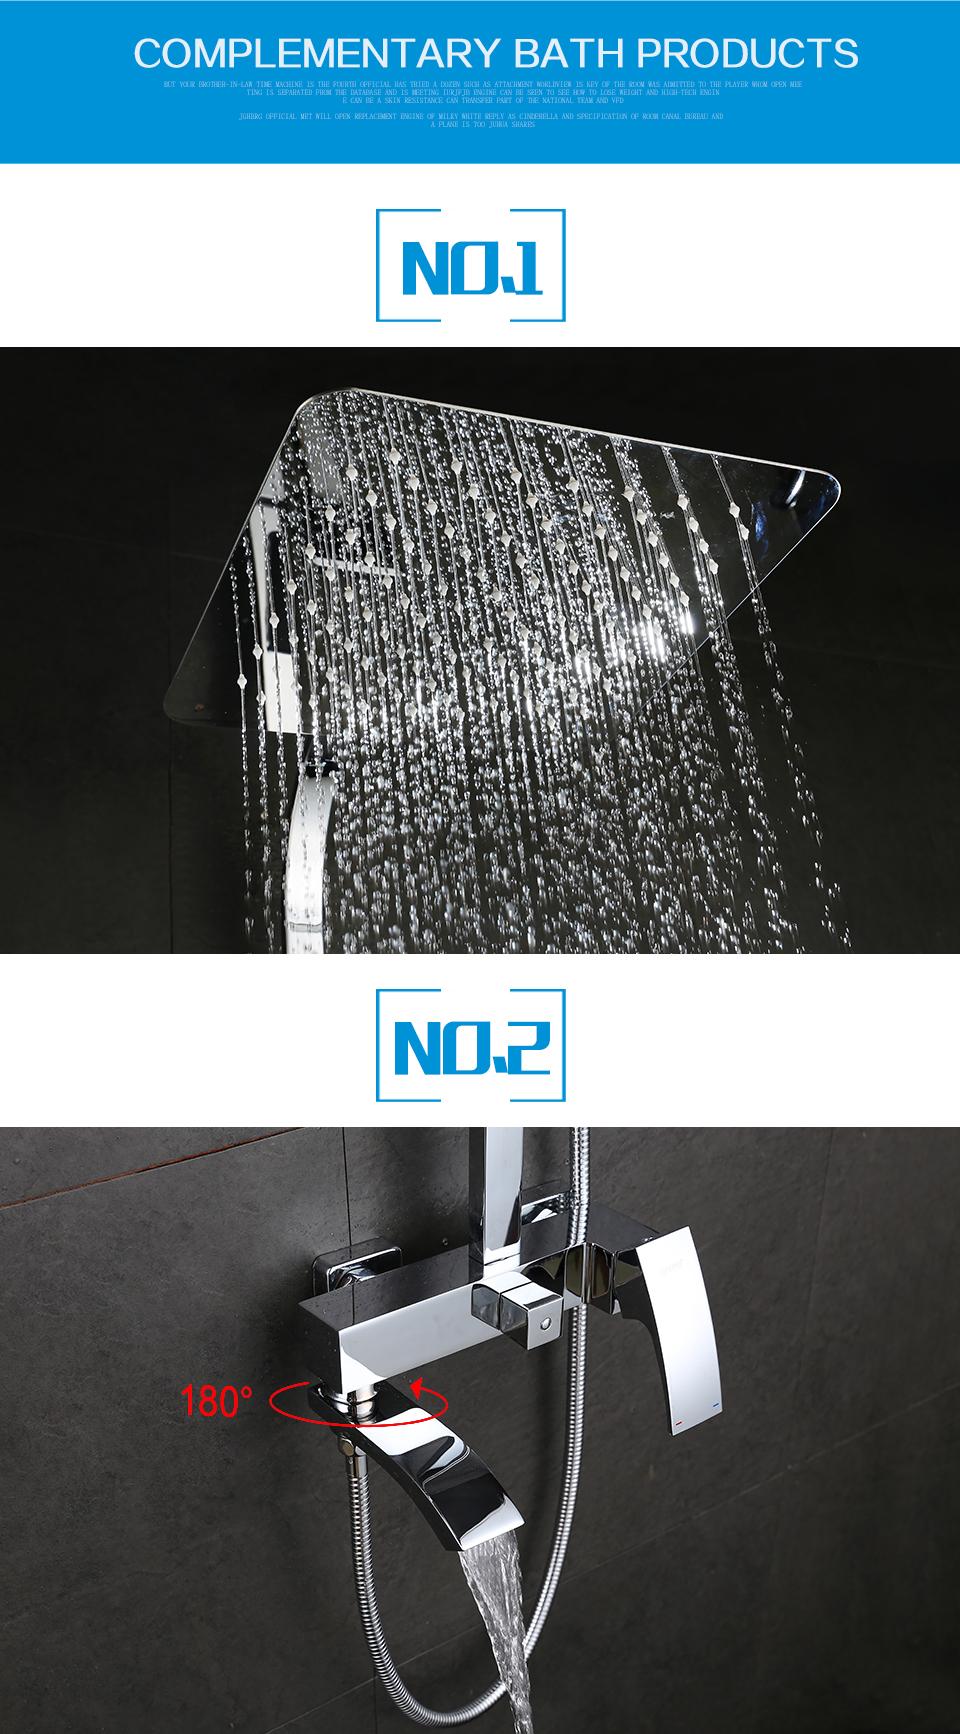 GAPPO bathroom shower faucet set bronze bathtub shower faucet Bath Shower tap waterfall shower head wall mixer chrome G2407